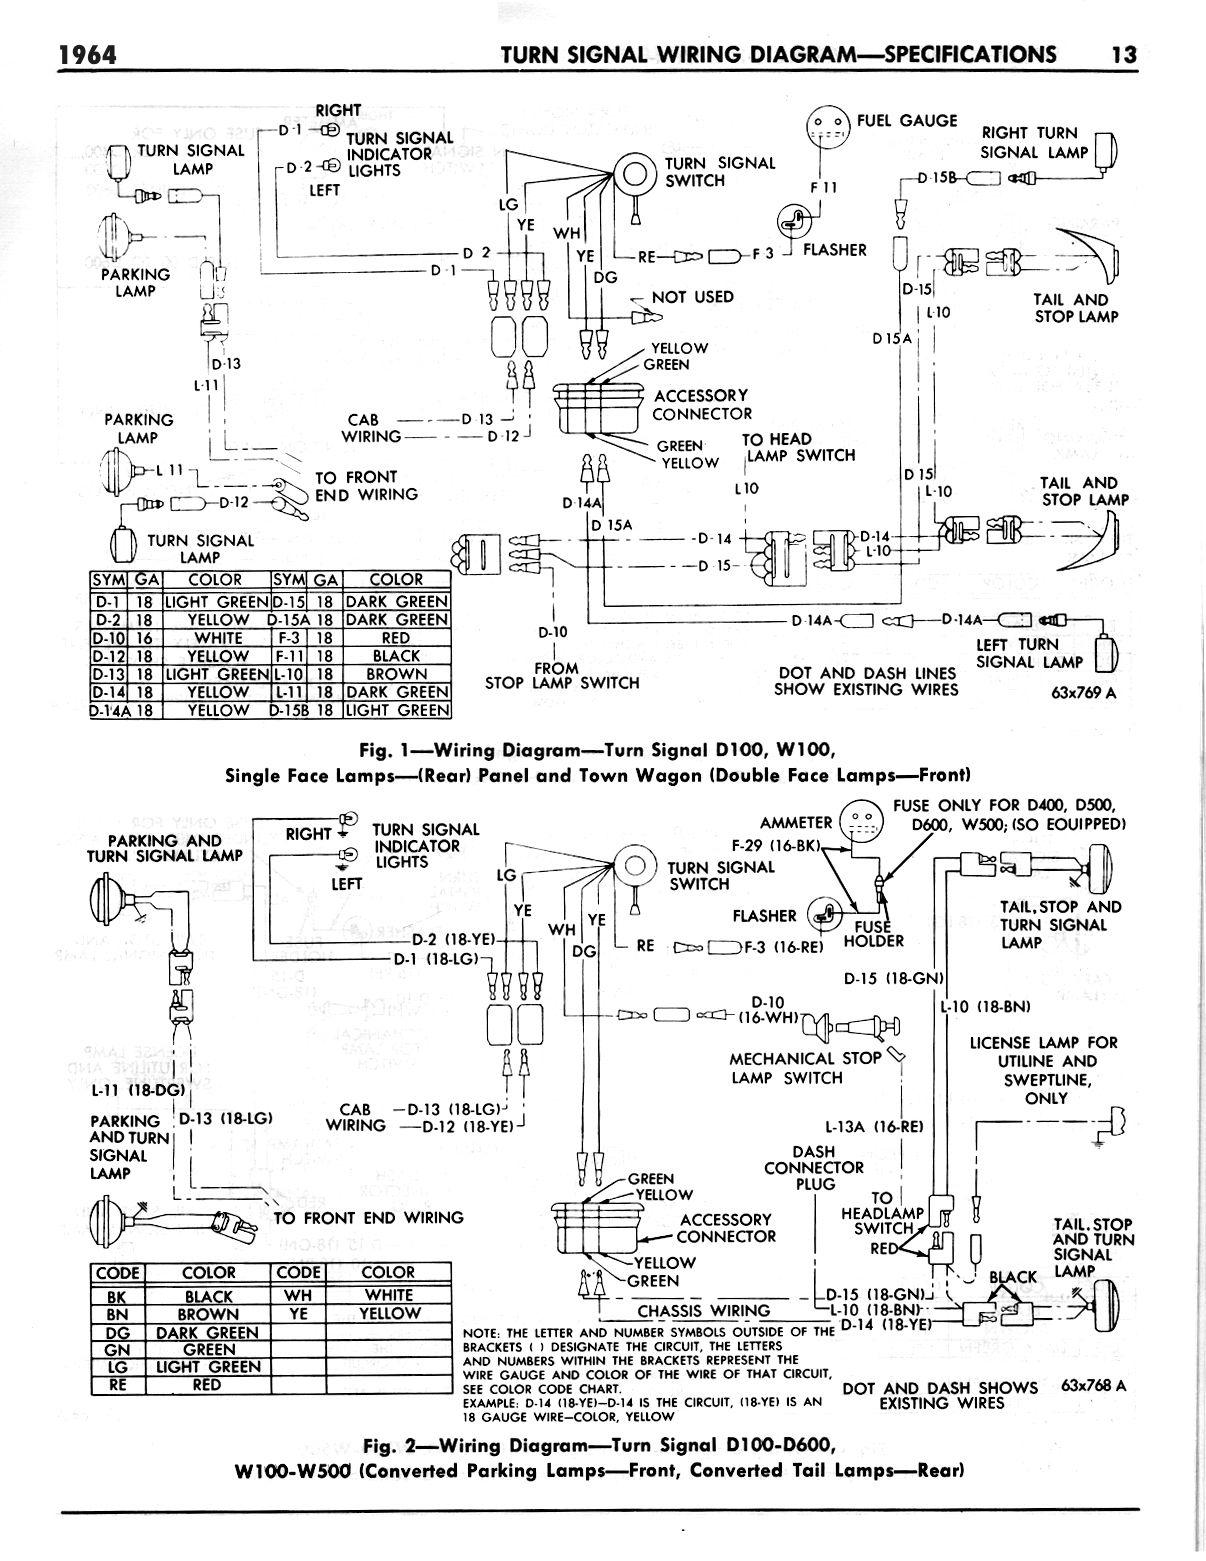 Wire Diagram 1978 Dodge D100 Wiring Diagrams 1987 D200 1979 1976